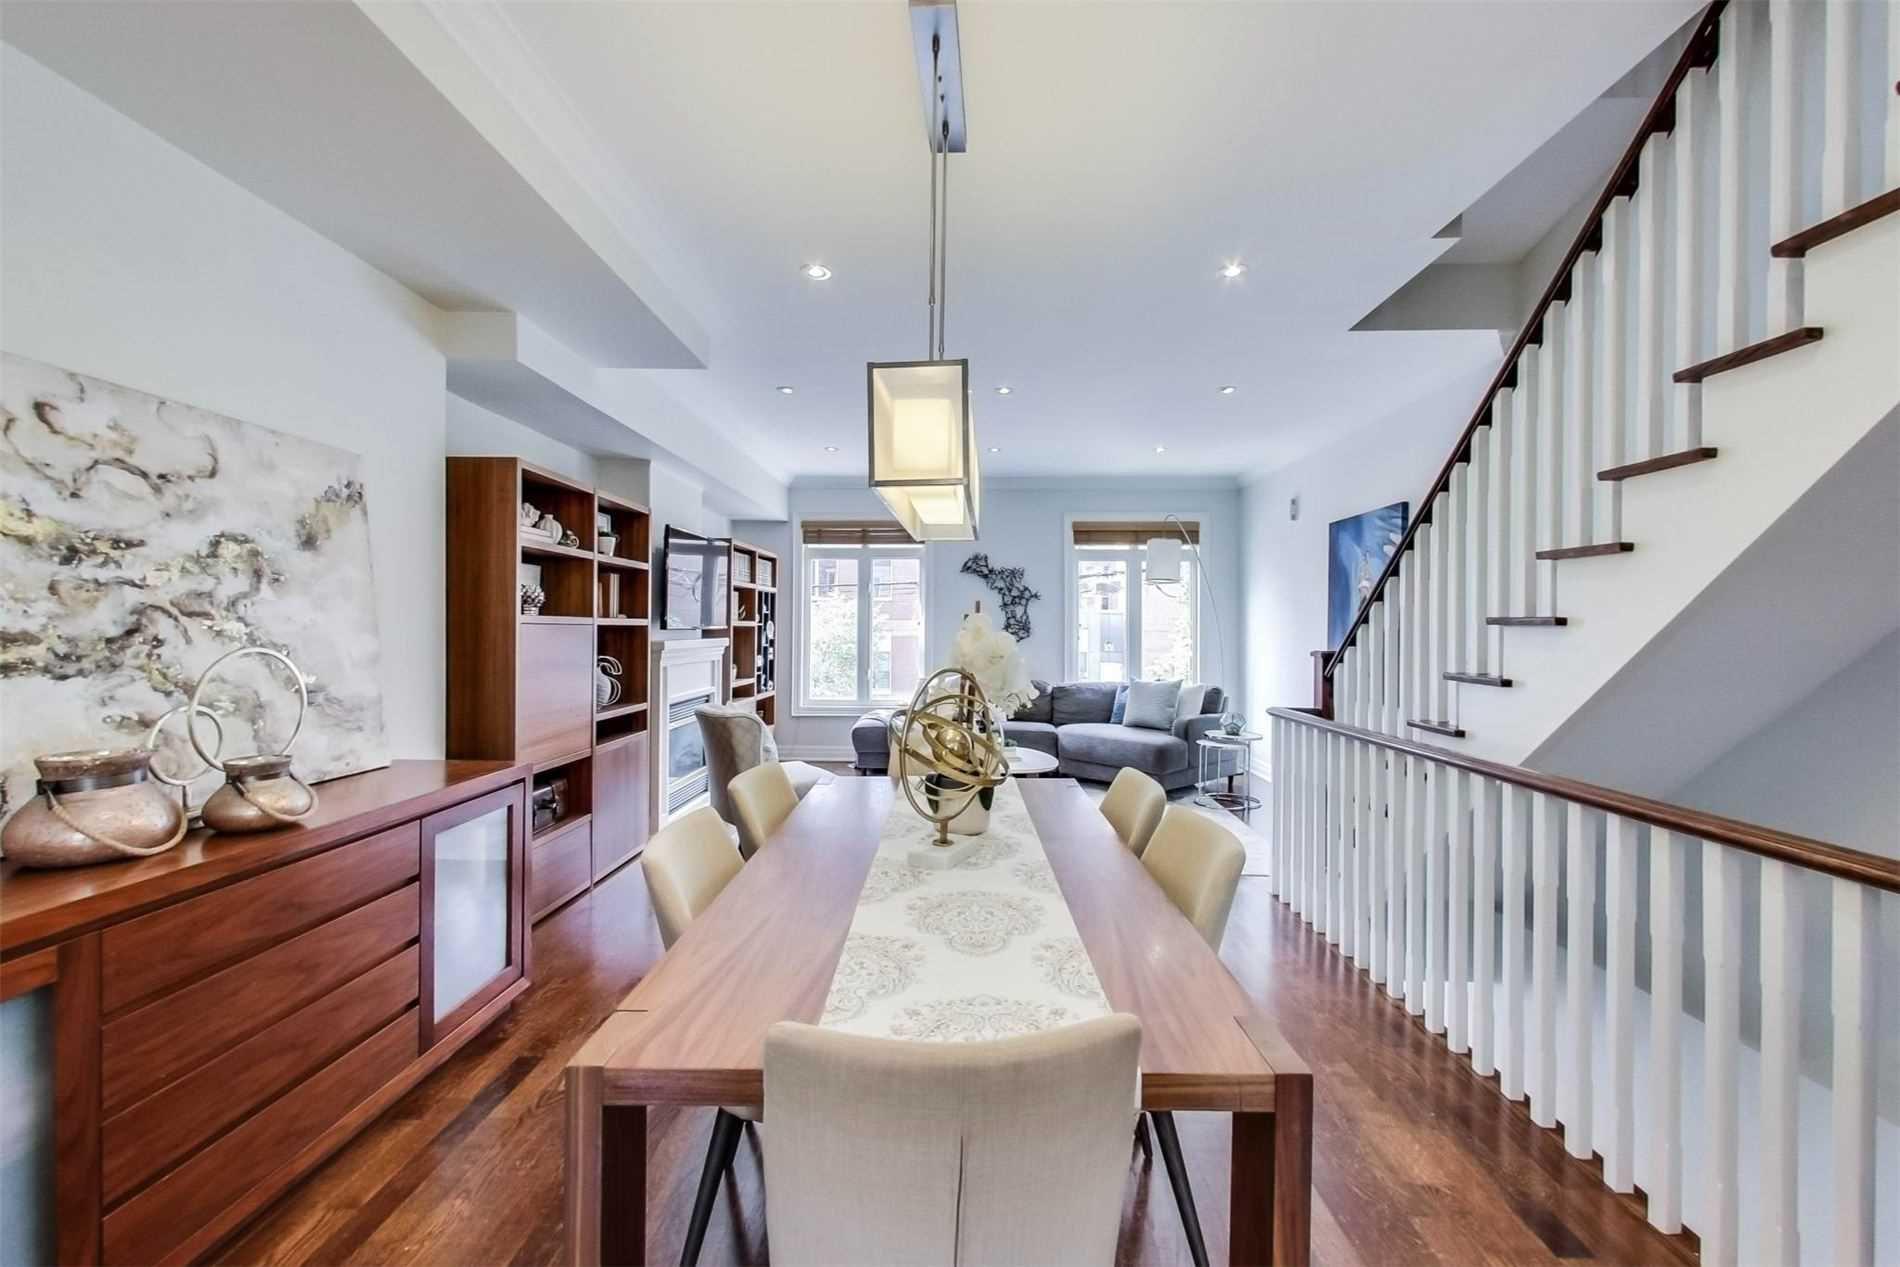 Photo 8: Photos: 213 Heward Avenue in Toronto: South Riverdale House (3-Storey) for sale (Toronto E01)  : MLS®# E4941877